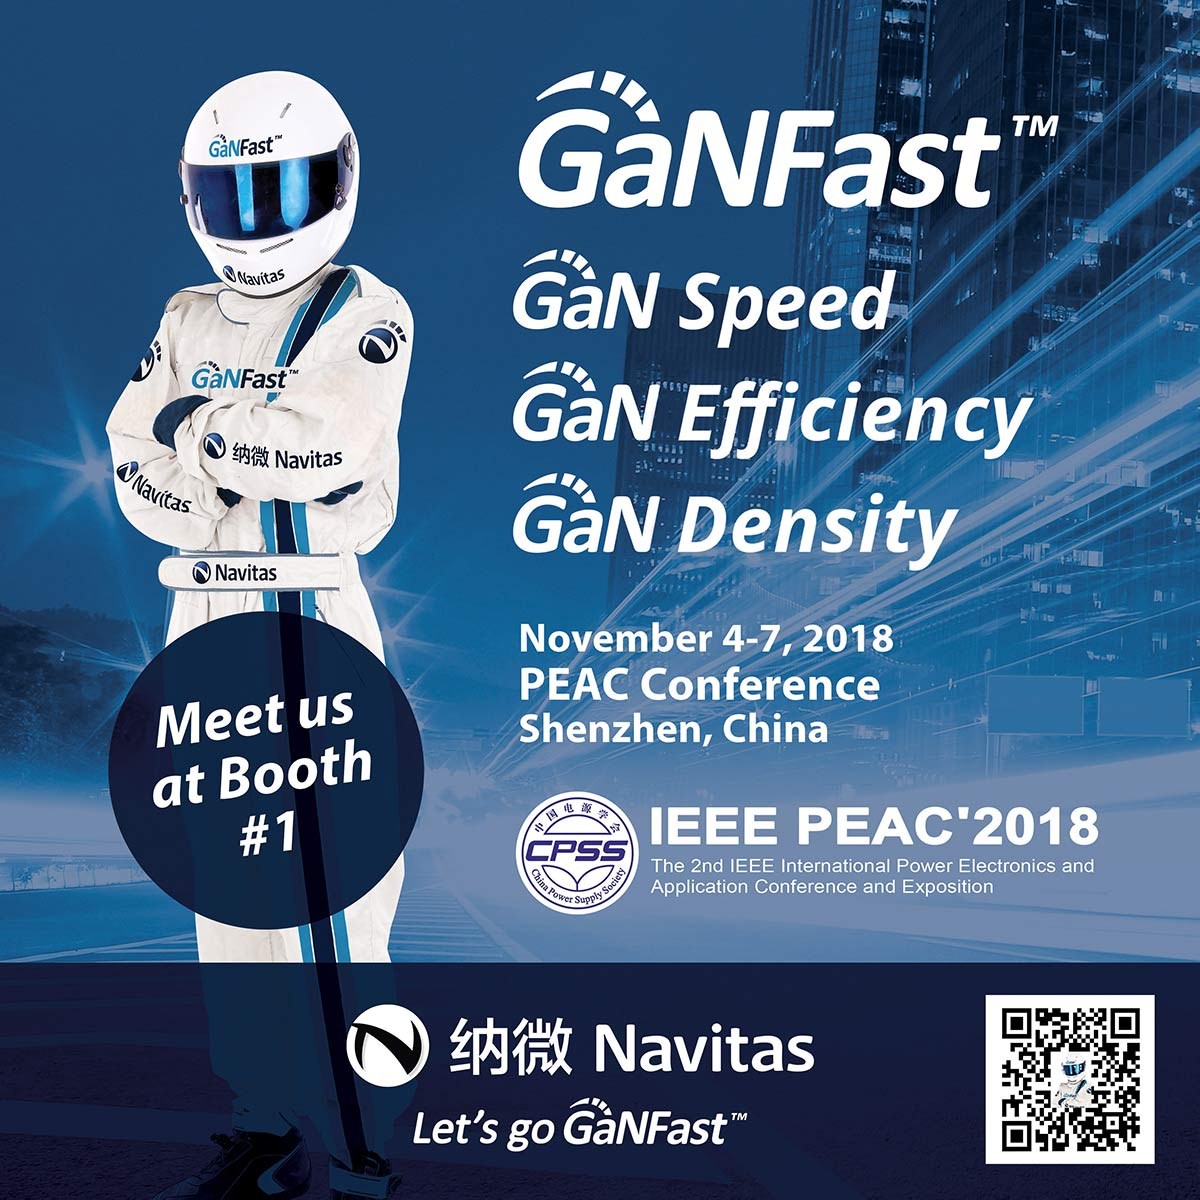 Navitas Announces GaNFast™ Advances at Premier Chinese Power Electronics Conference